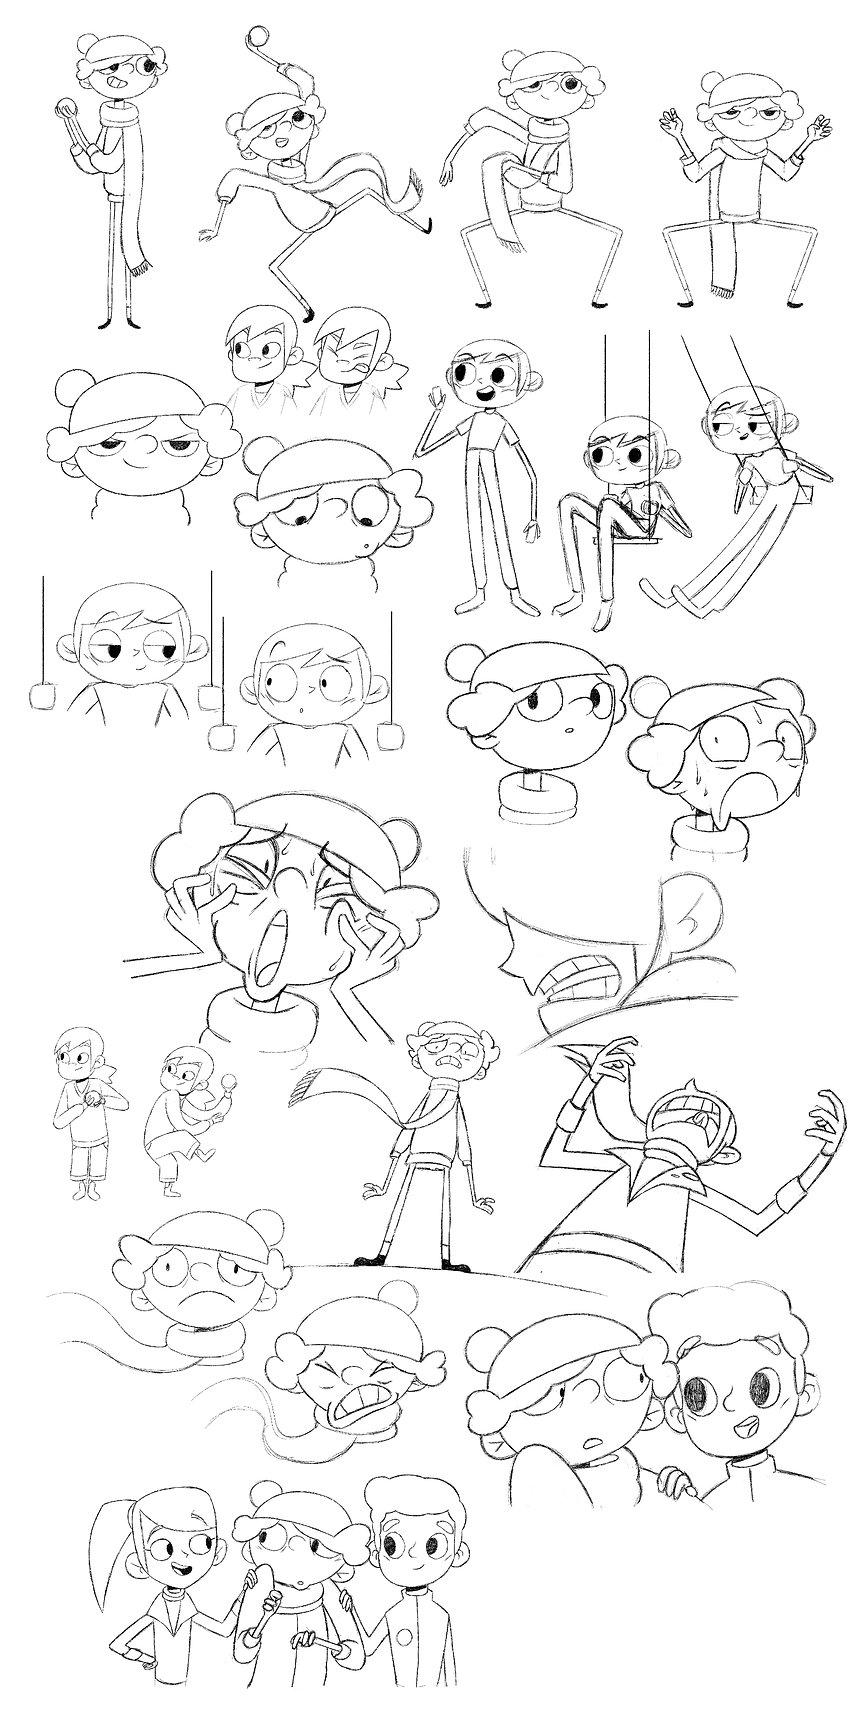 wbf_sketches.jpg